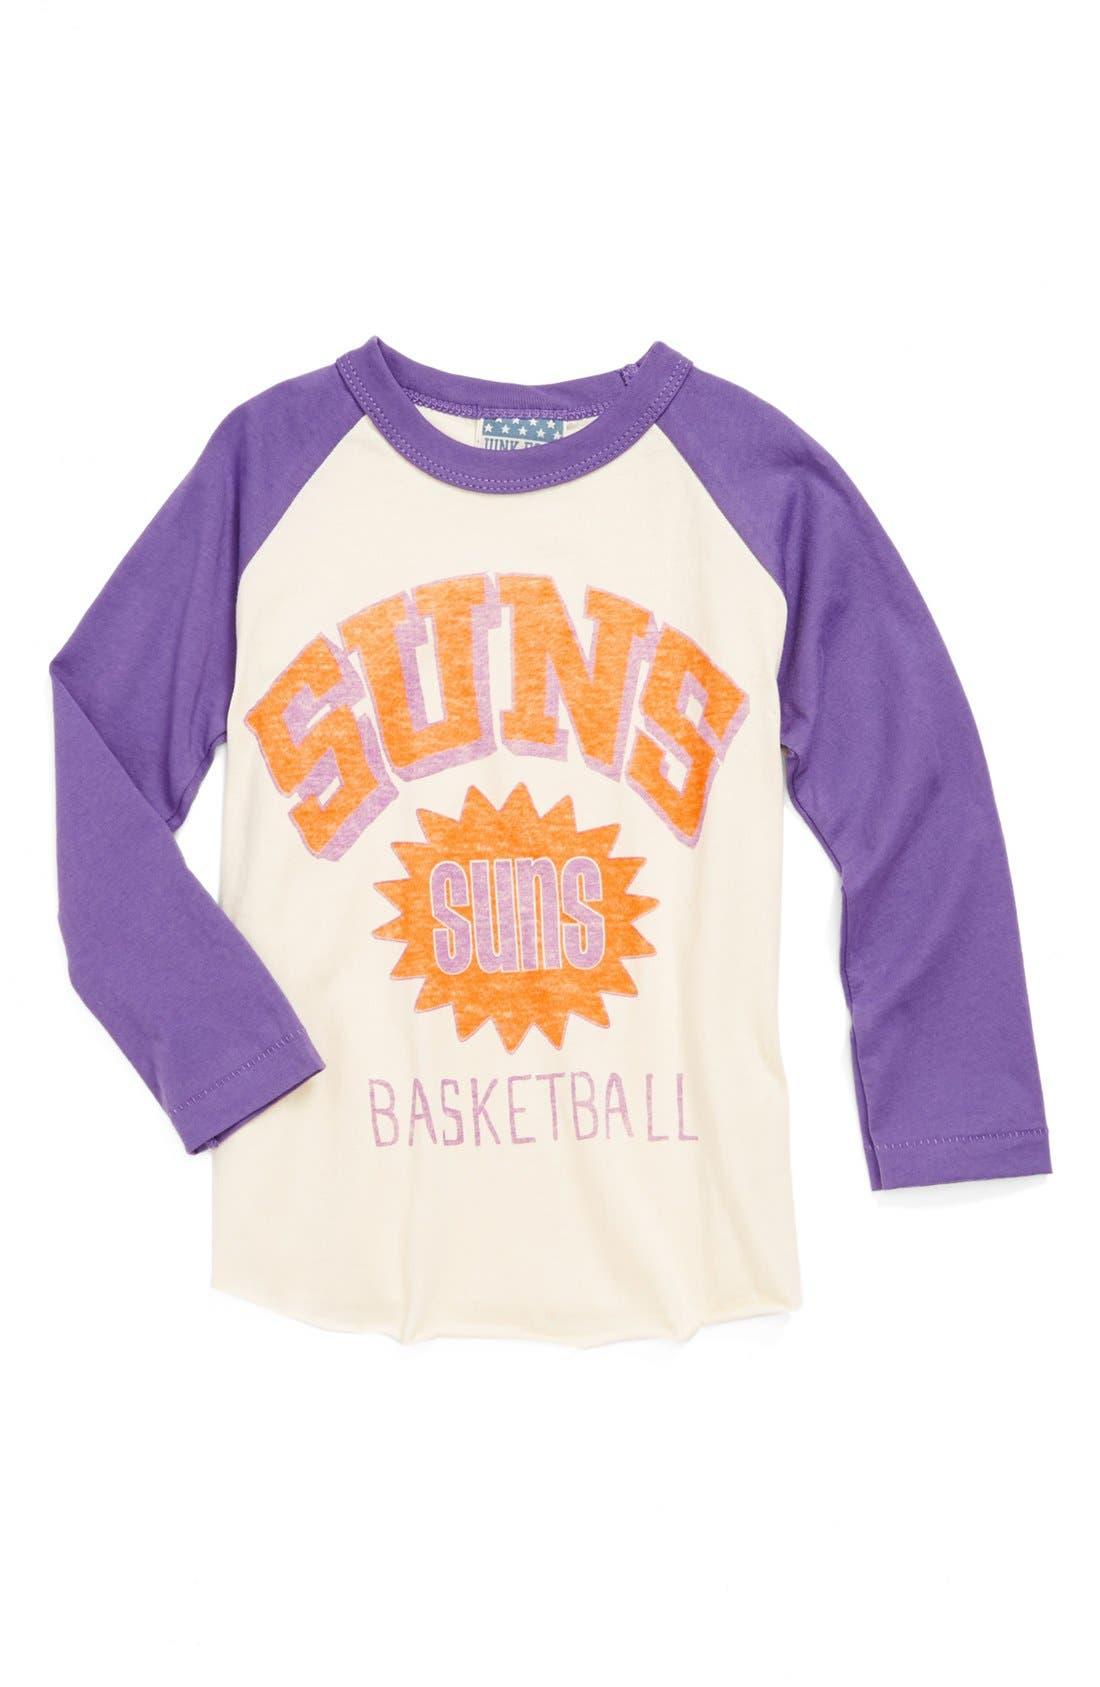 Alternate Image 1 Selected - Junk Food 'Phoenix Suns' Long Sleeve T-Shirt (Toddler Boys)